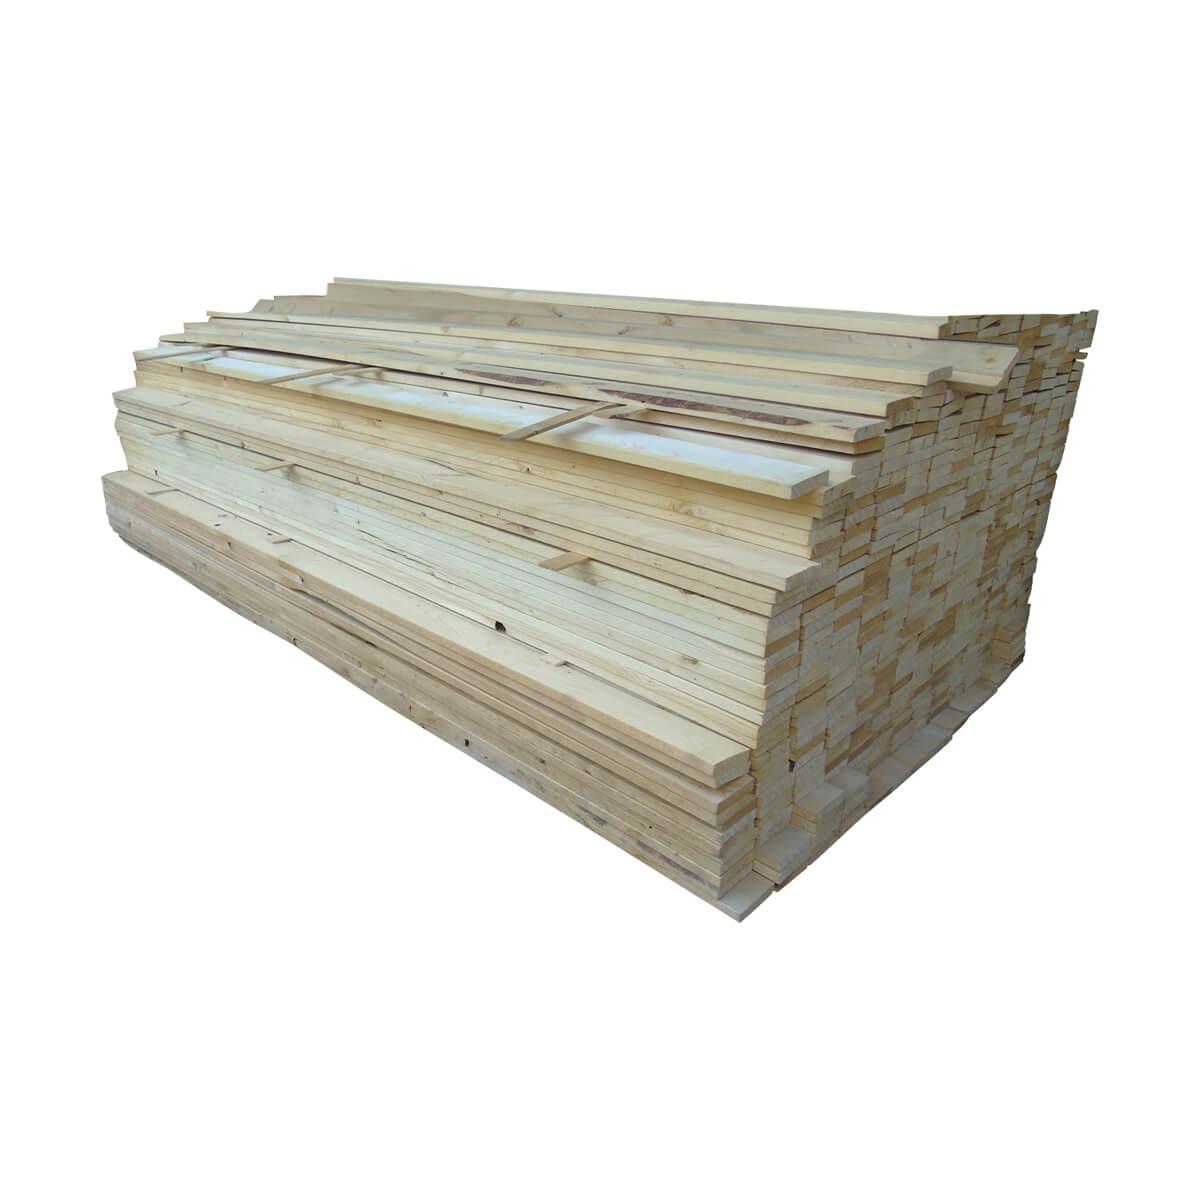 #3 Spruce Lumber - SPR #3 - 1 x 4 x 12-ft